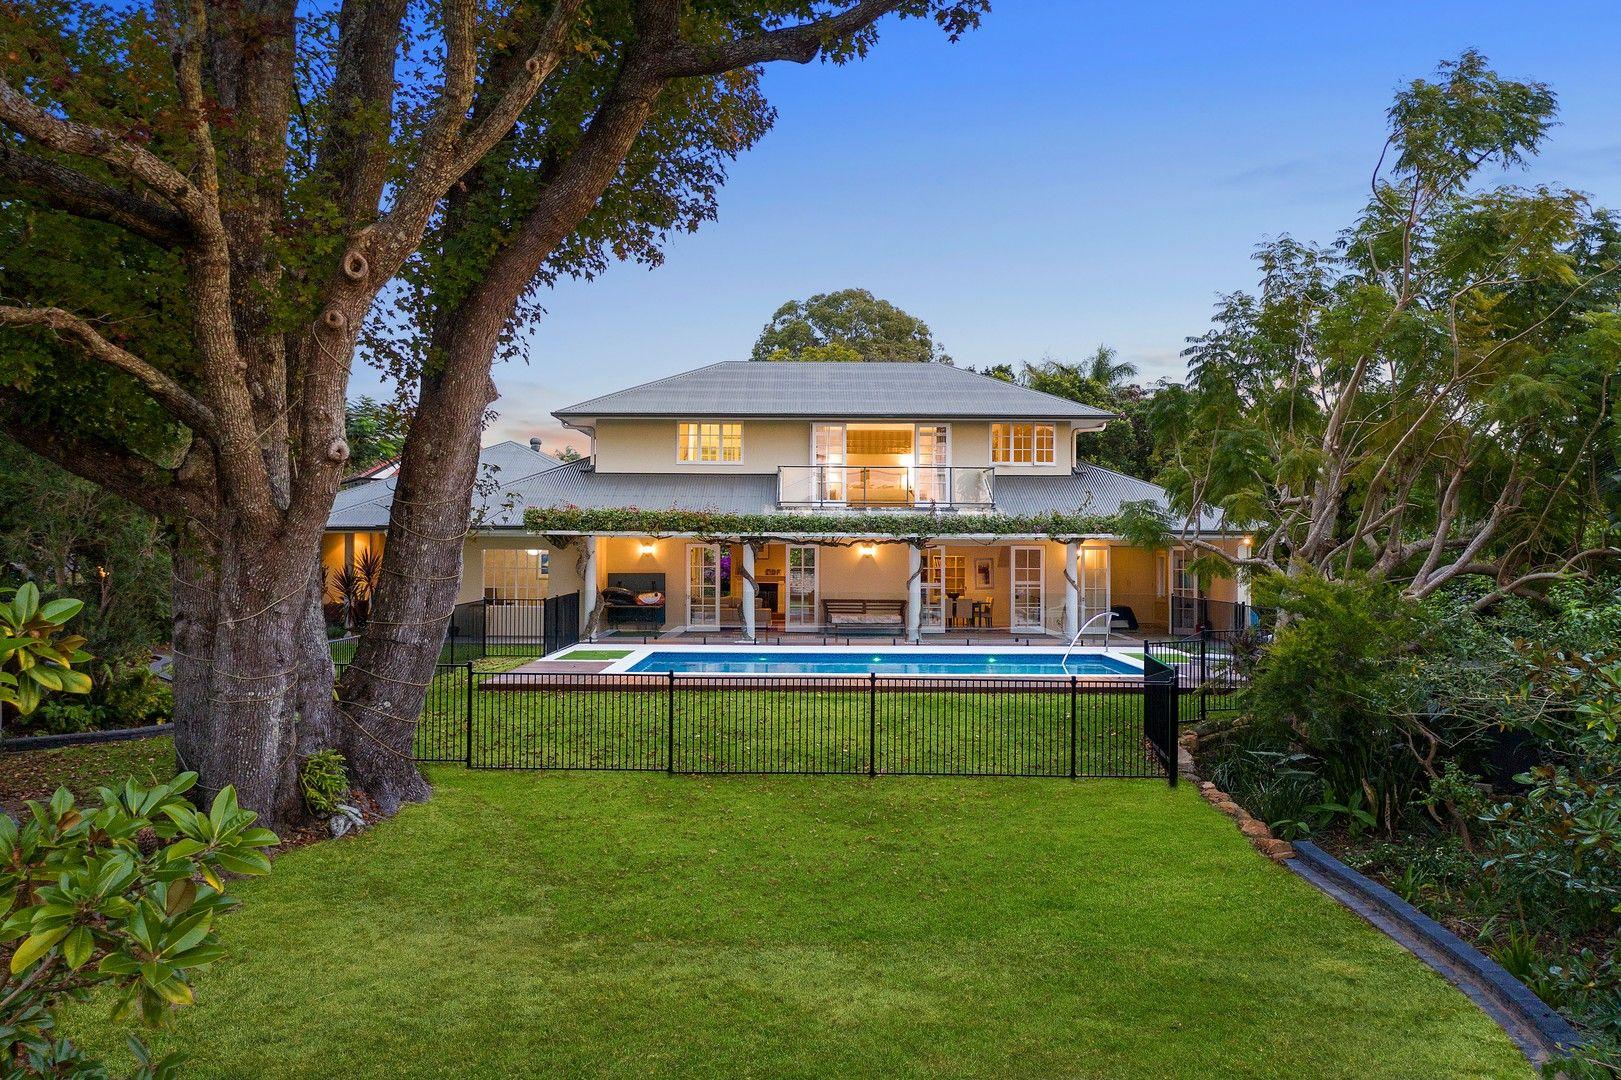 19-21 Foote Avenue, Buderim QLD 4556, Image 0